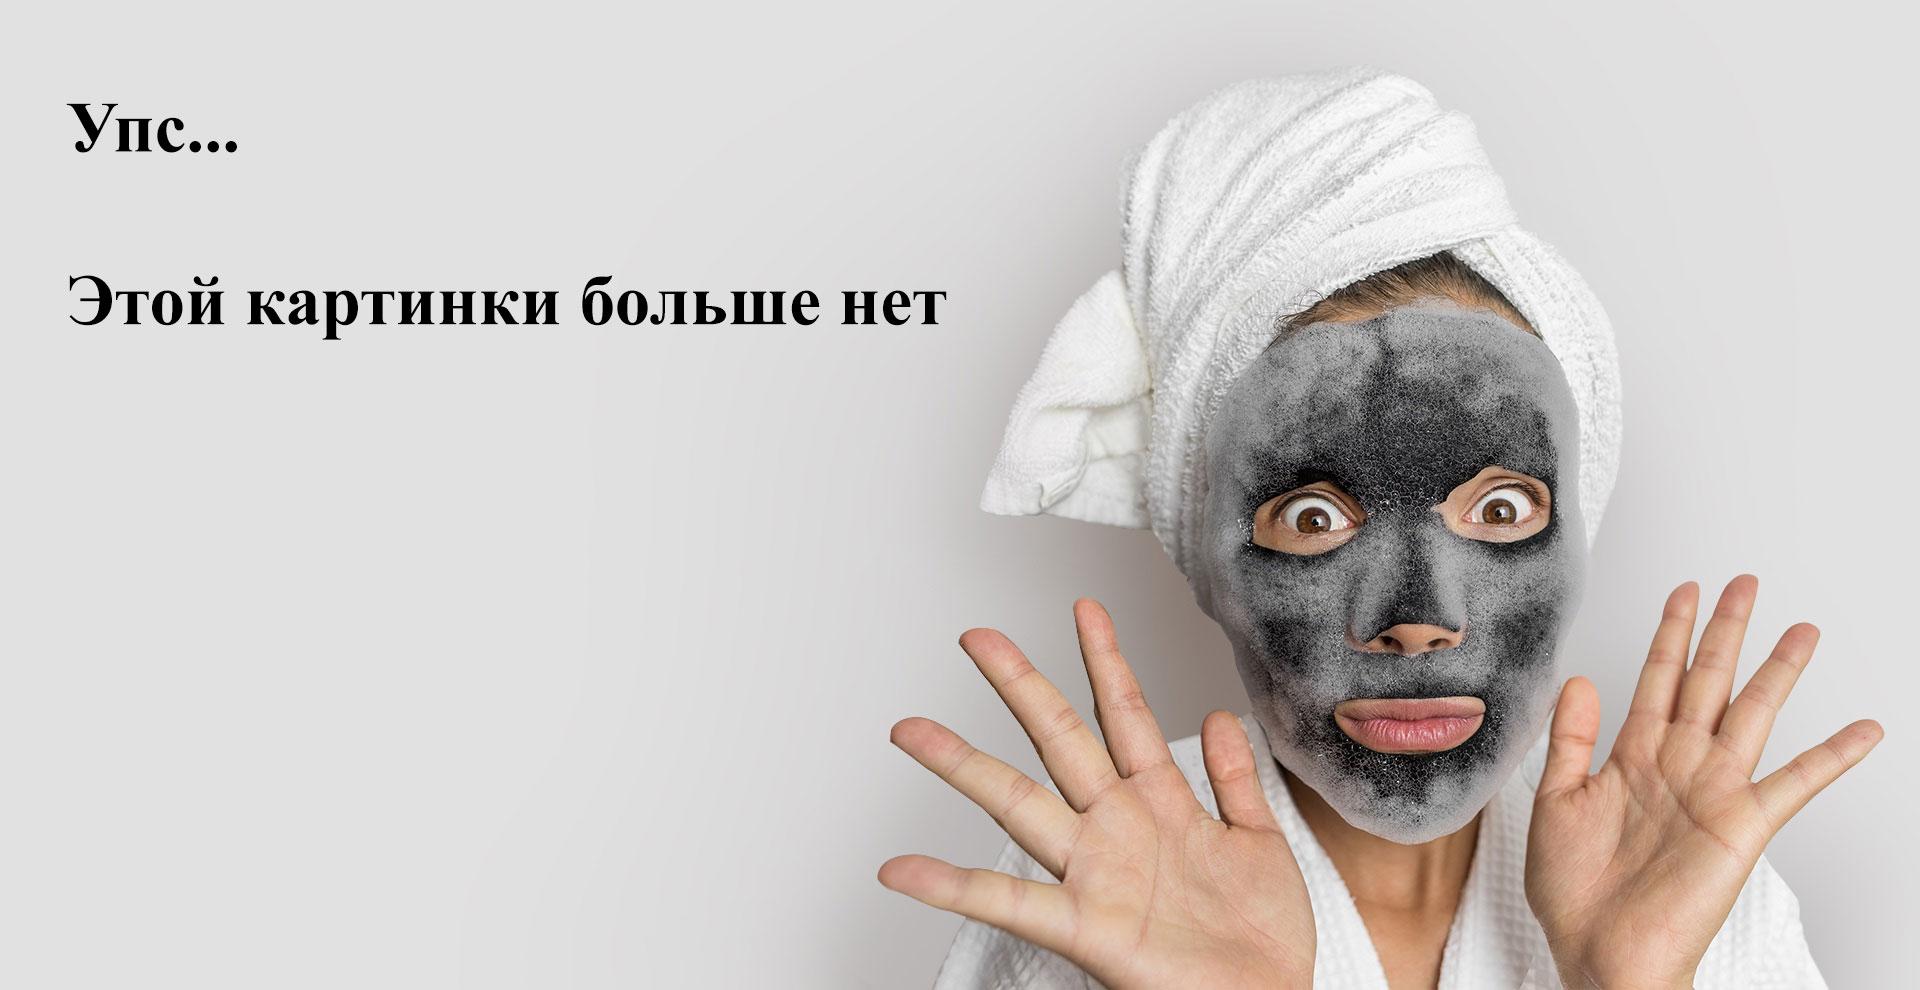 Siberina, Концентрат масел для лица «Витаминный комплекс A, E, C, F», 30 мл